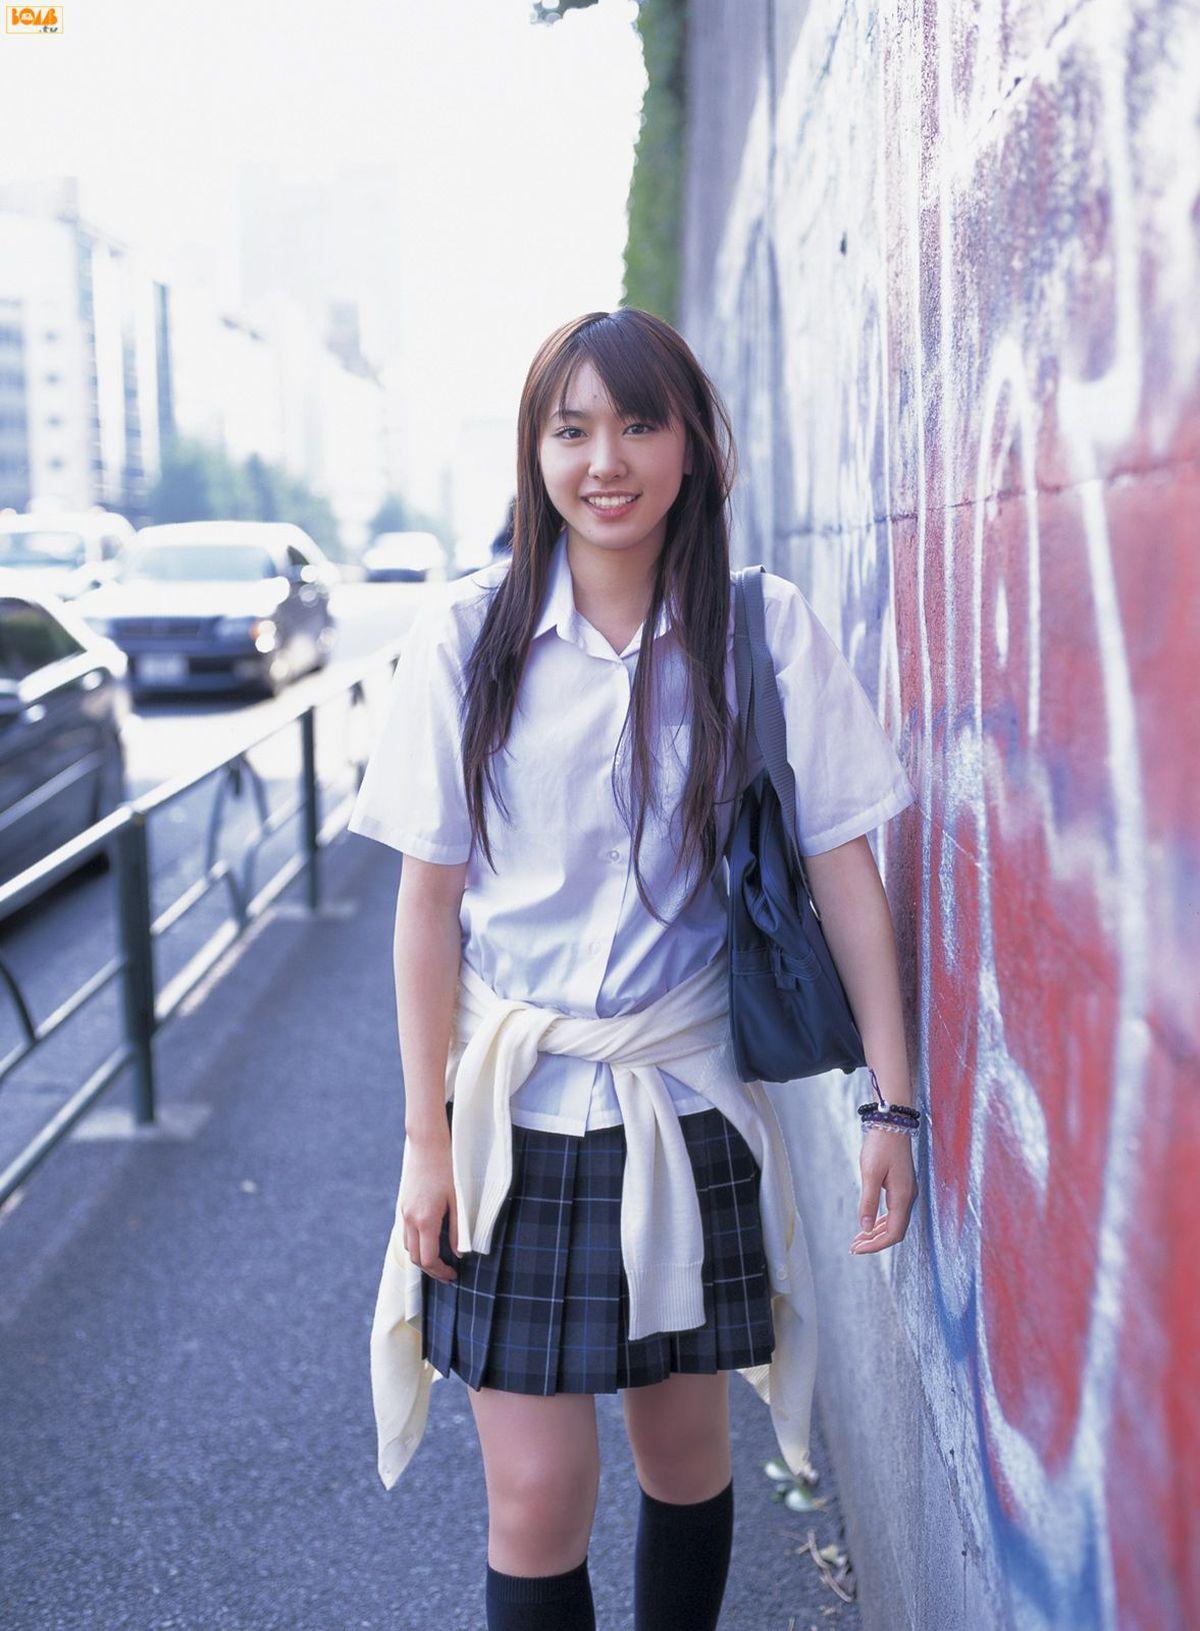 [Bomb.TV] 2006年07月刊 Yui Aragaki 新垣結衣/新垣结衣 写真集1